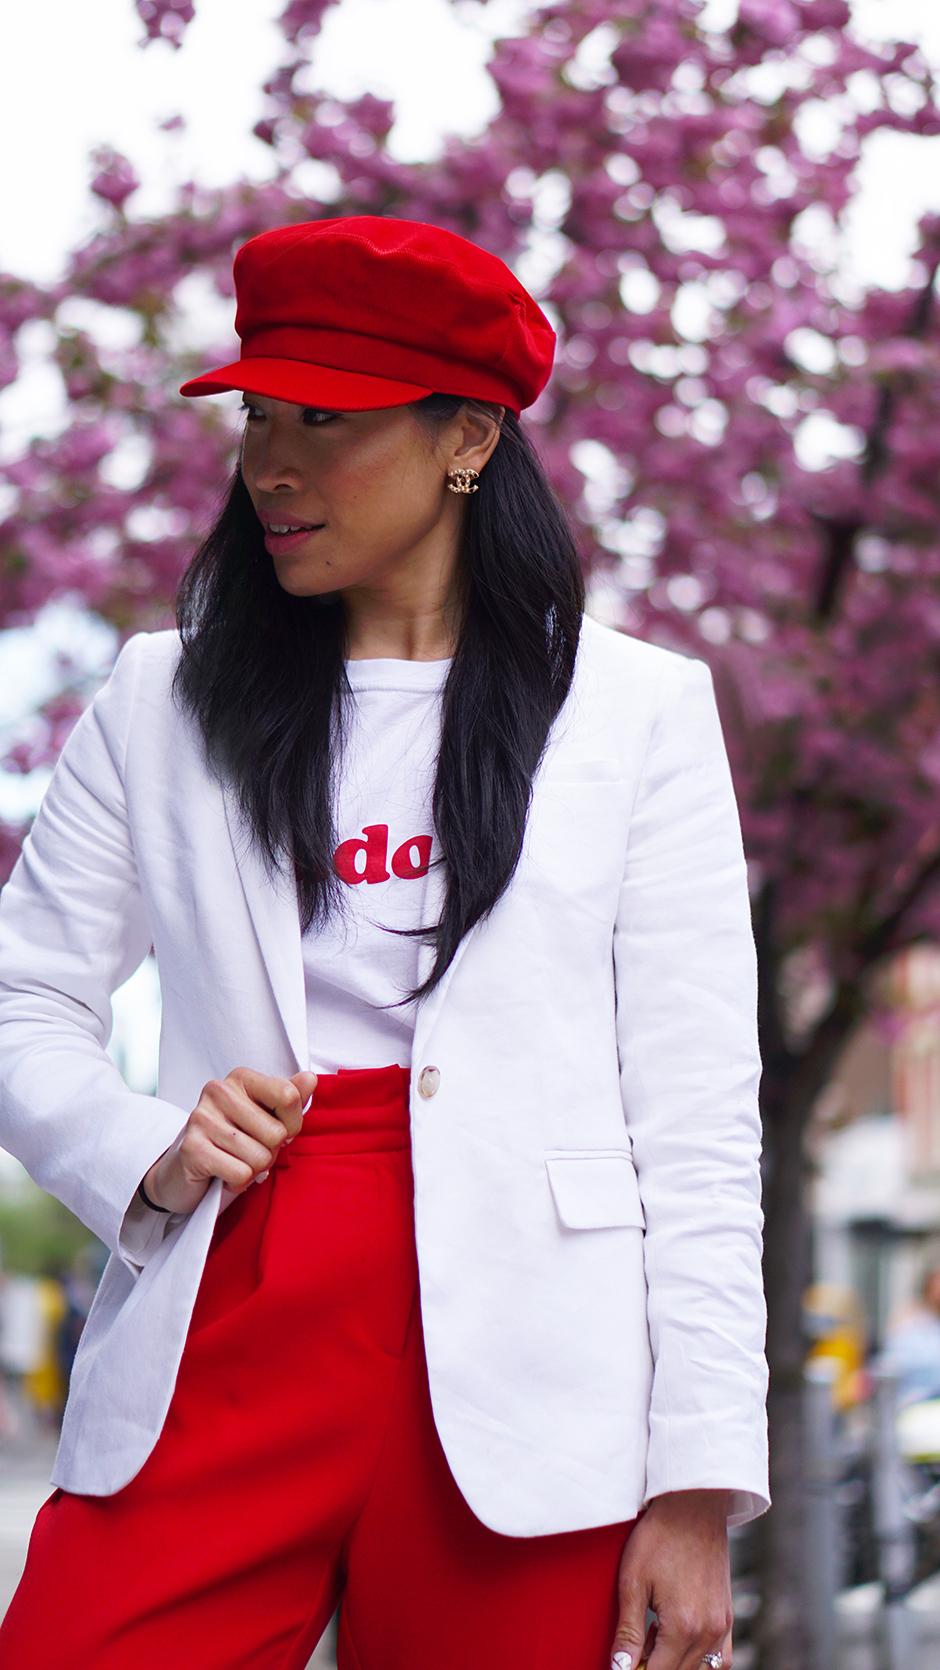 Spring Fashion with Banana Republic #ad #fashionblog #styleblog #fashionblogger #springoutfit #outfitideas #accessories #sakura #shopthelook #redoutfit #redhat #bakercap #outfitinspiration #outfitideas #streetstyle #whiteblazer #cottonblazer #linenblazer #fashioninfluencer #outfitinspiration #outfitideas #casualstyle #travelstyle